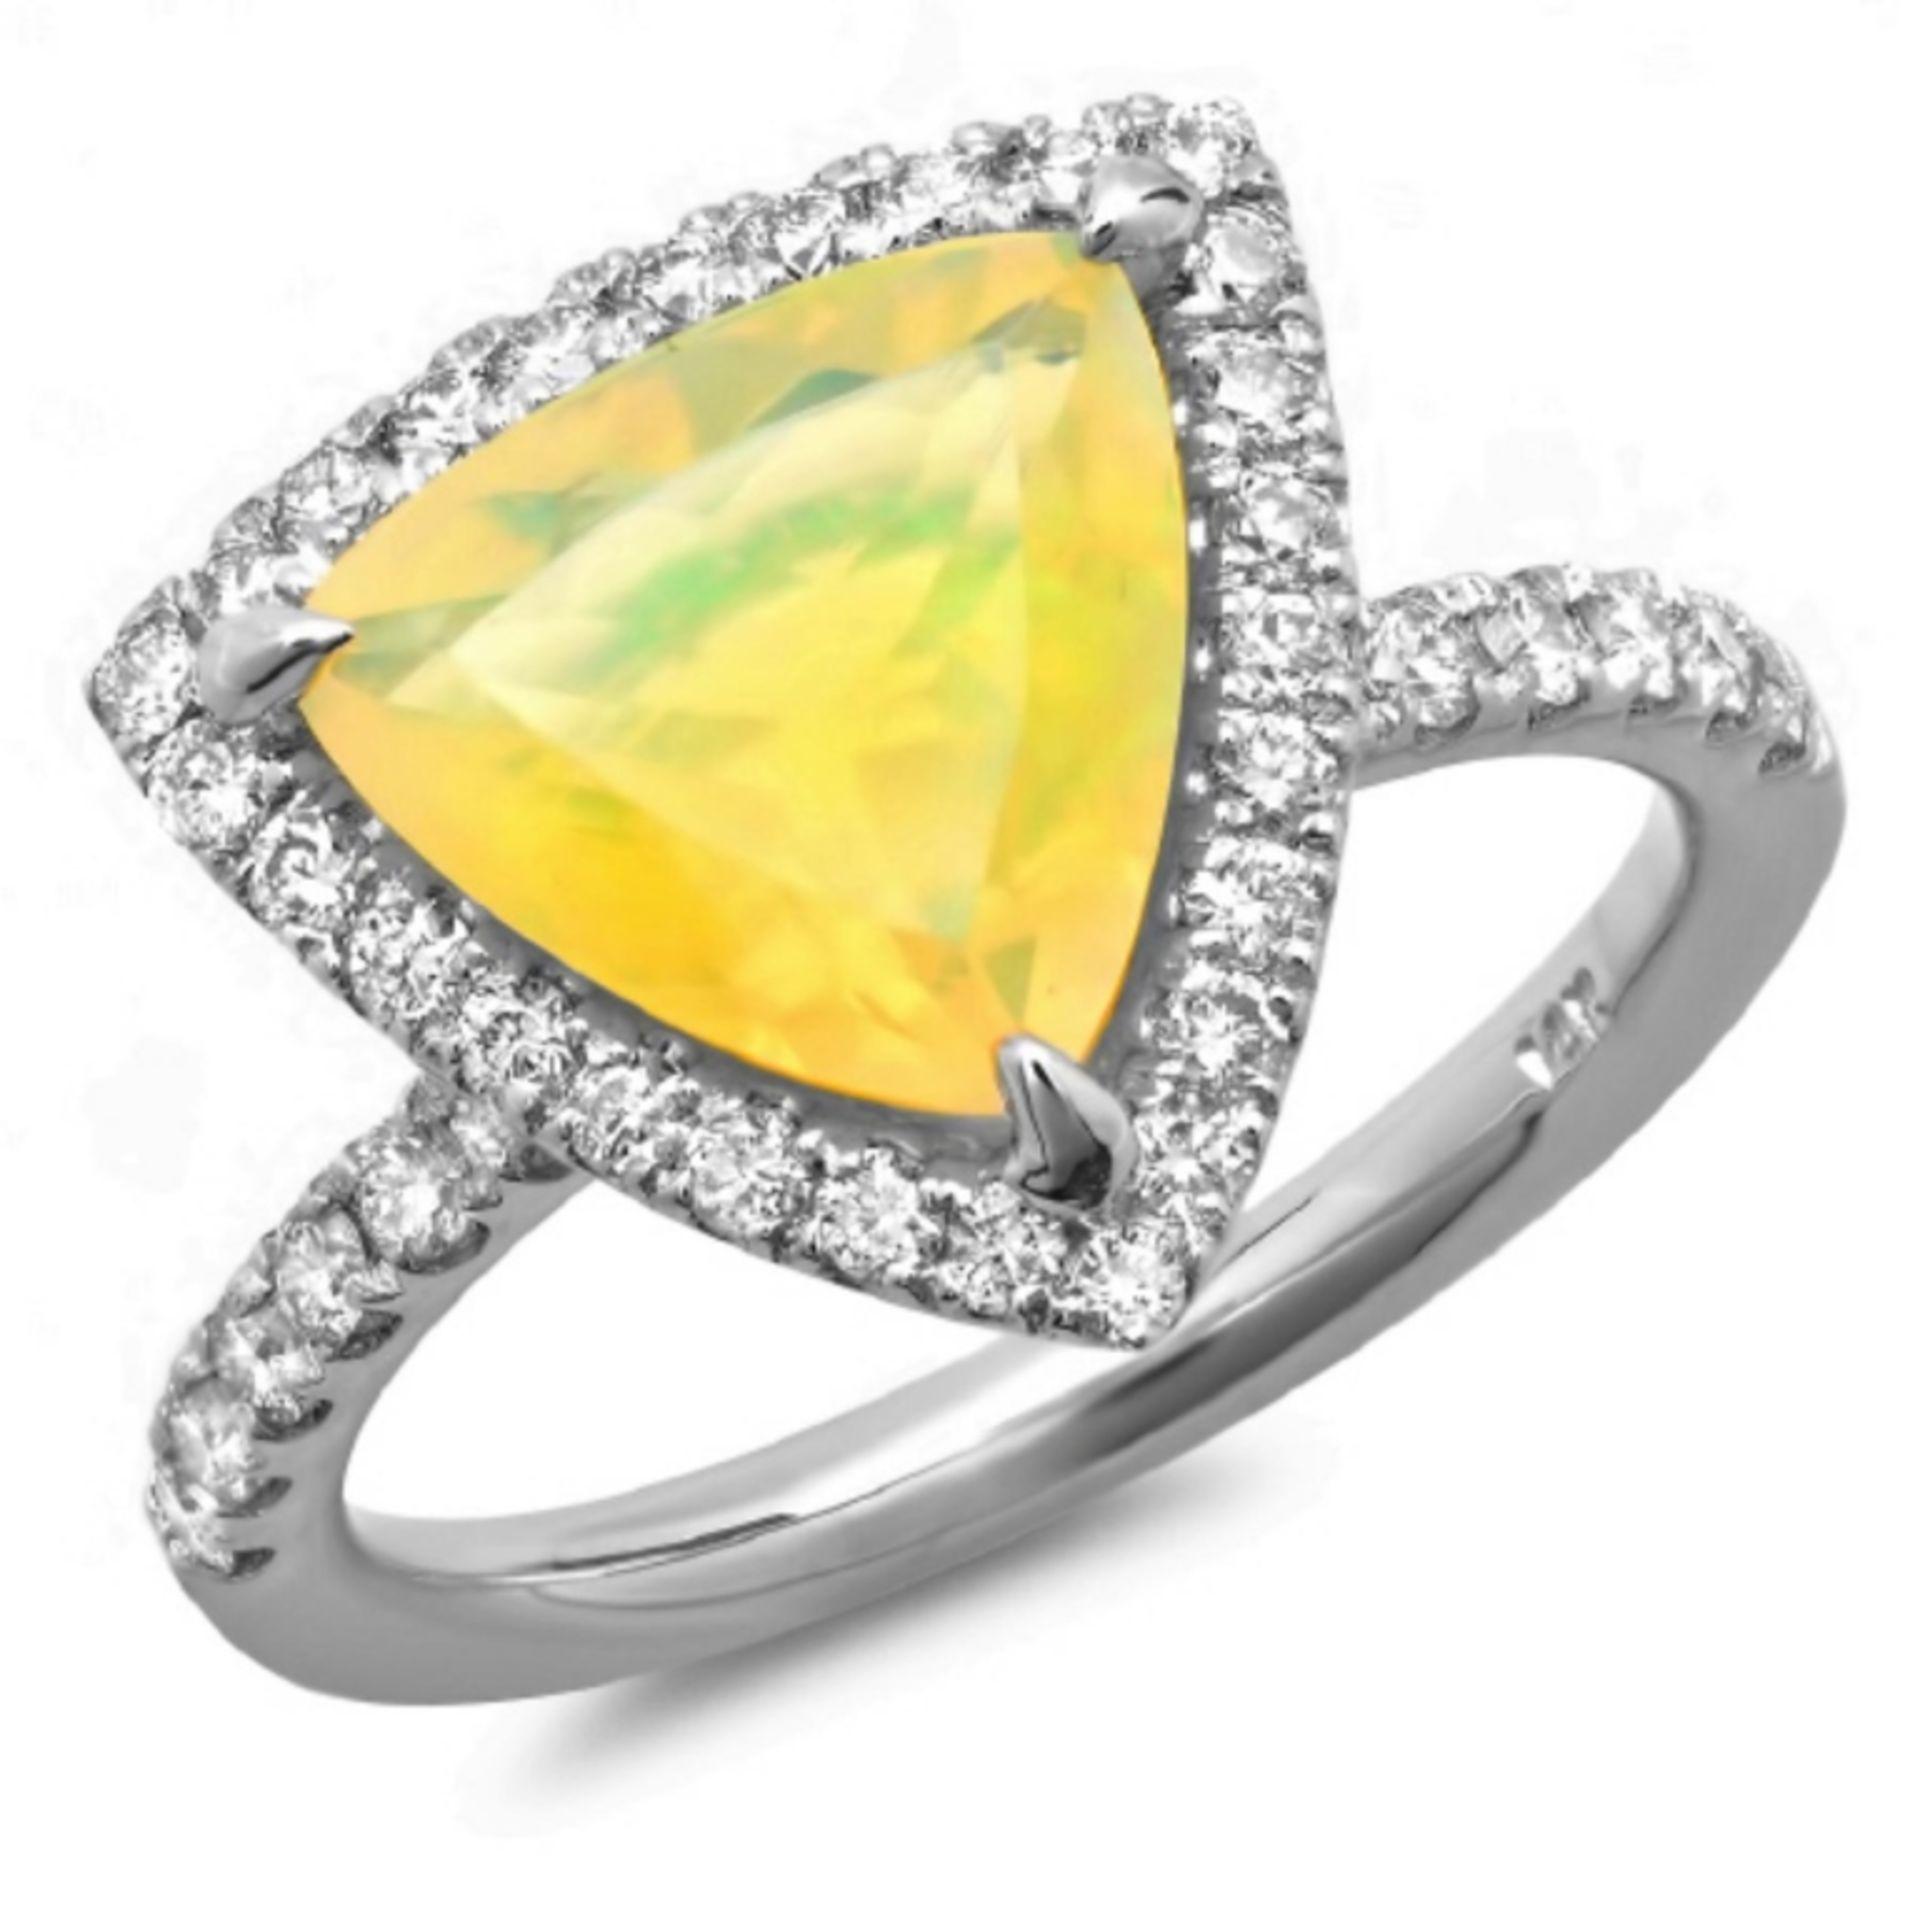 14K Gold 2.00ct Opal & 0.60ct Diamond Ring